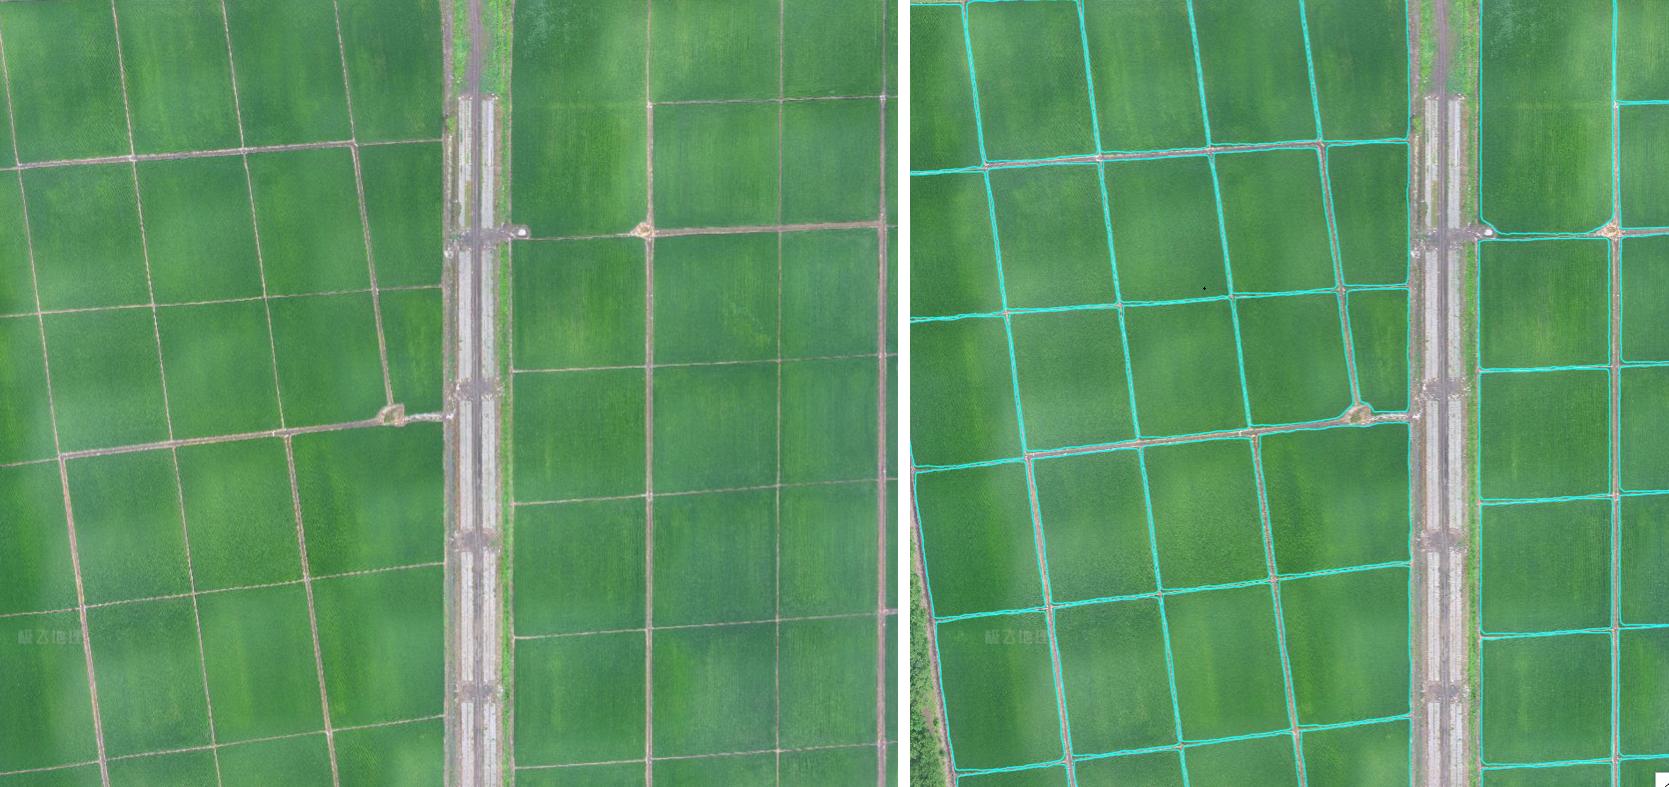 XAI 基于无人机高清图像自动识别农田边界(右)。该高清农田地图可导入植保无人机,指导无人机精准飞行并完成全自主作业。